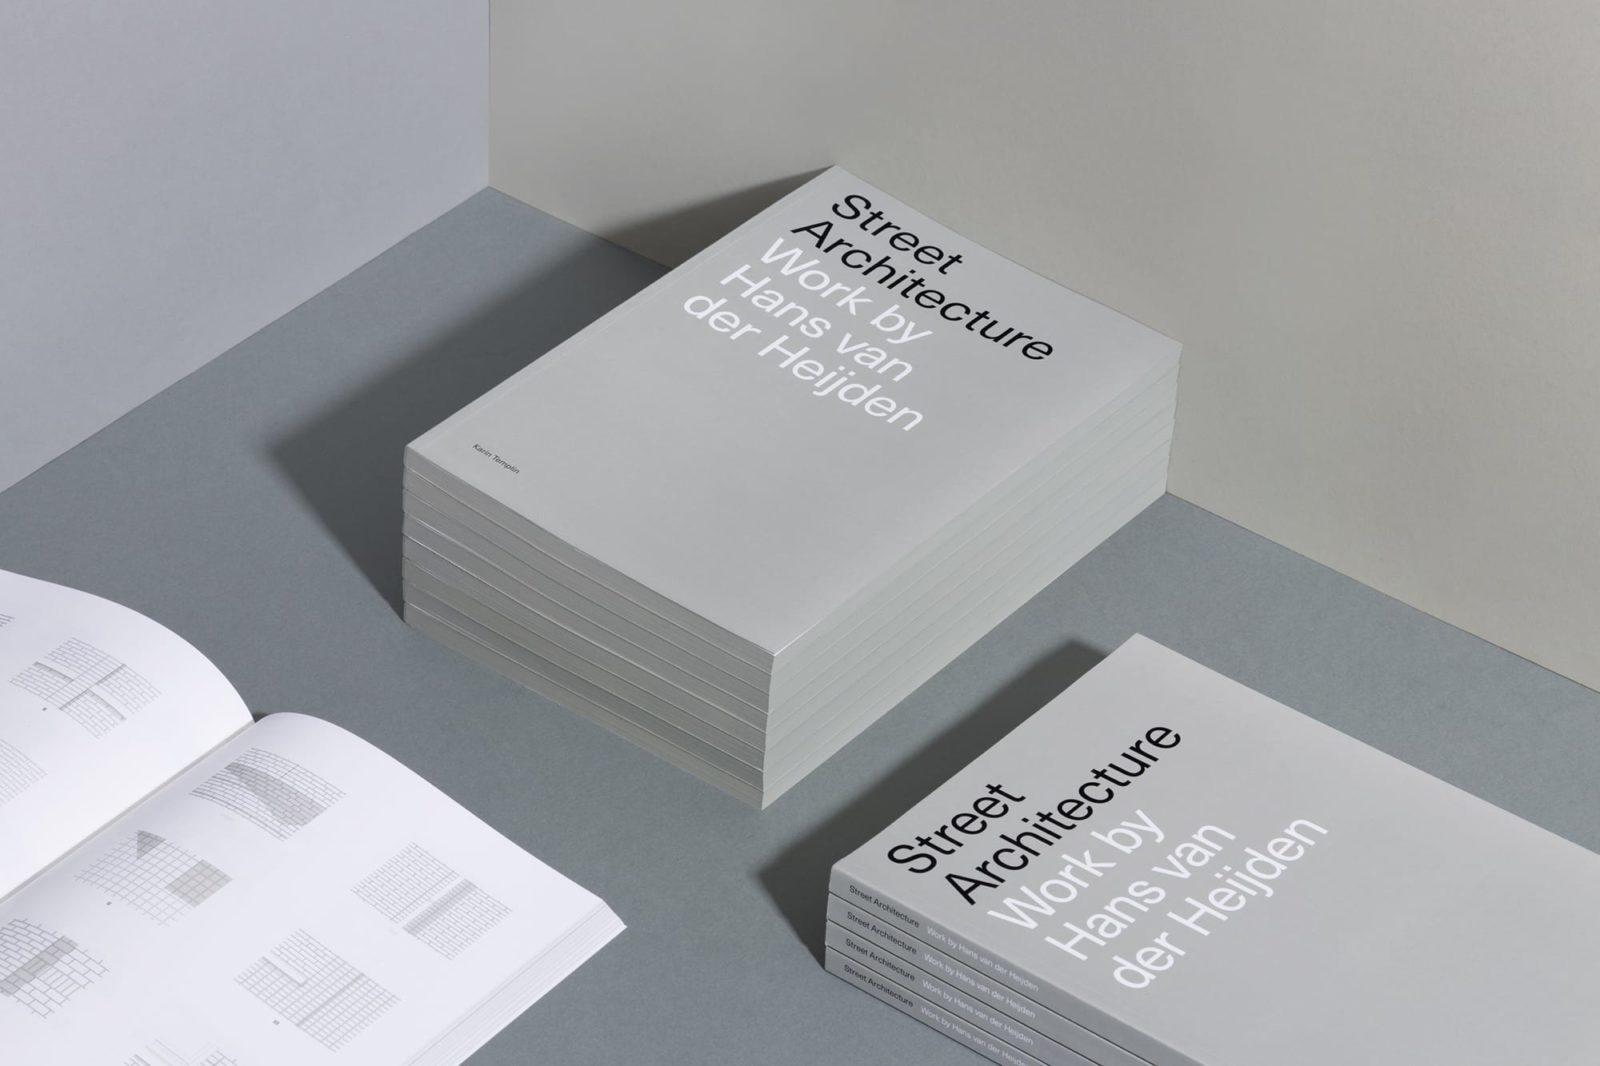 Haller Brun Hans van der Heijden Architect Street Architecture book architectural drawings duotone extra grey